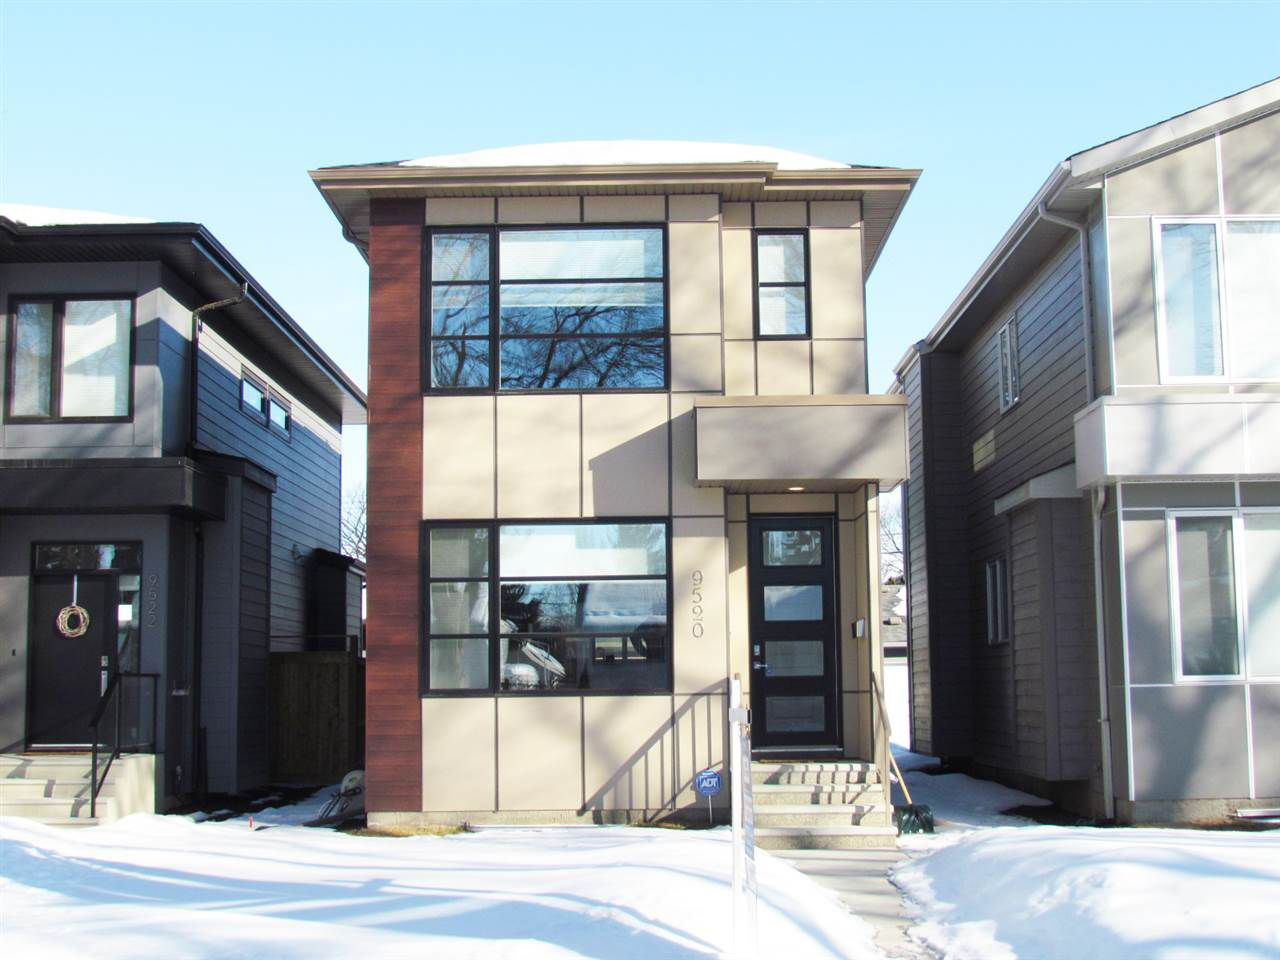 Main Photo: 9520 70 Avenue in Edmonton: Zone 17 House for sale : MLS®# E4147396